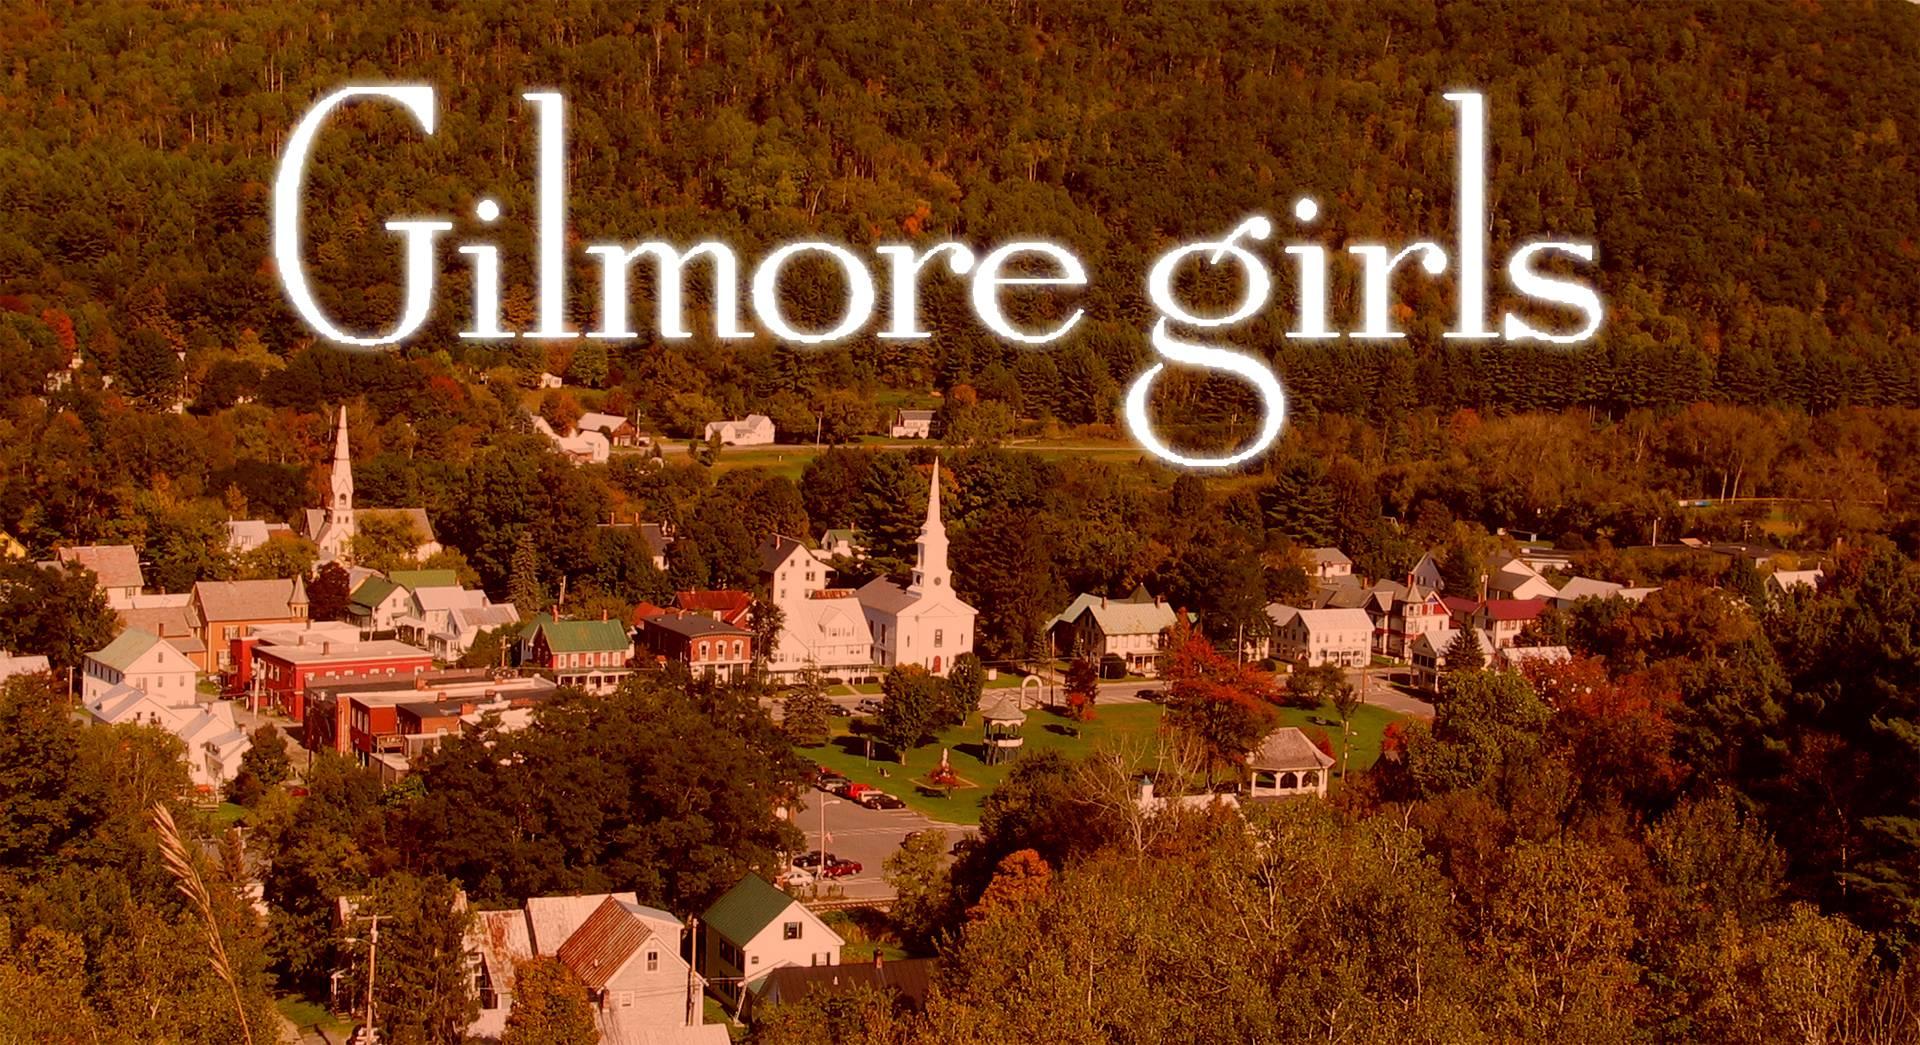 gilmore-girls-wallpapers-31573-3615852.jpg